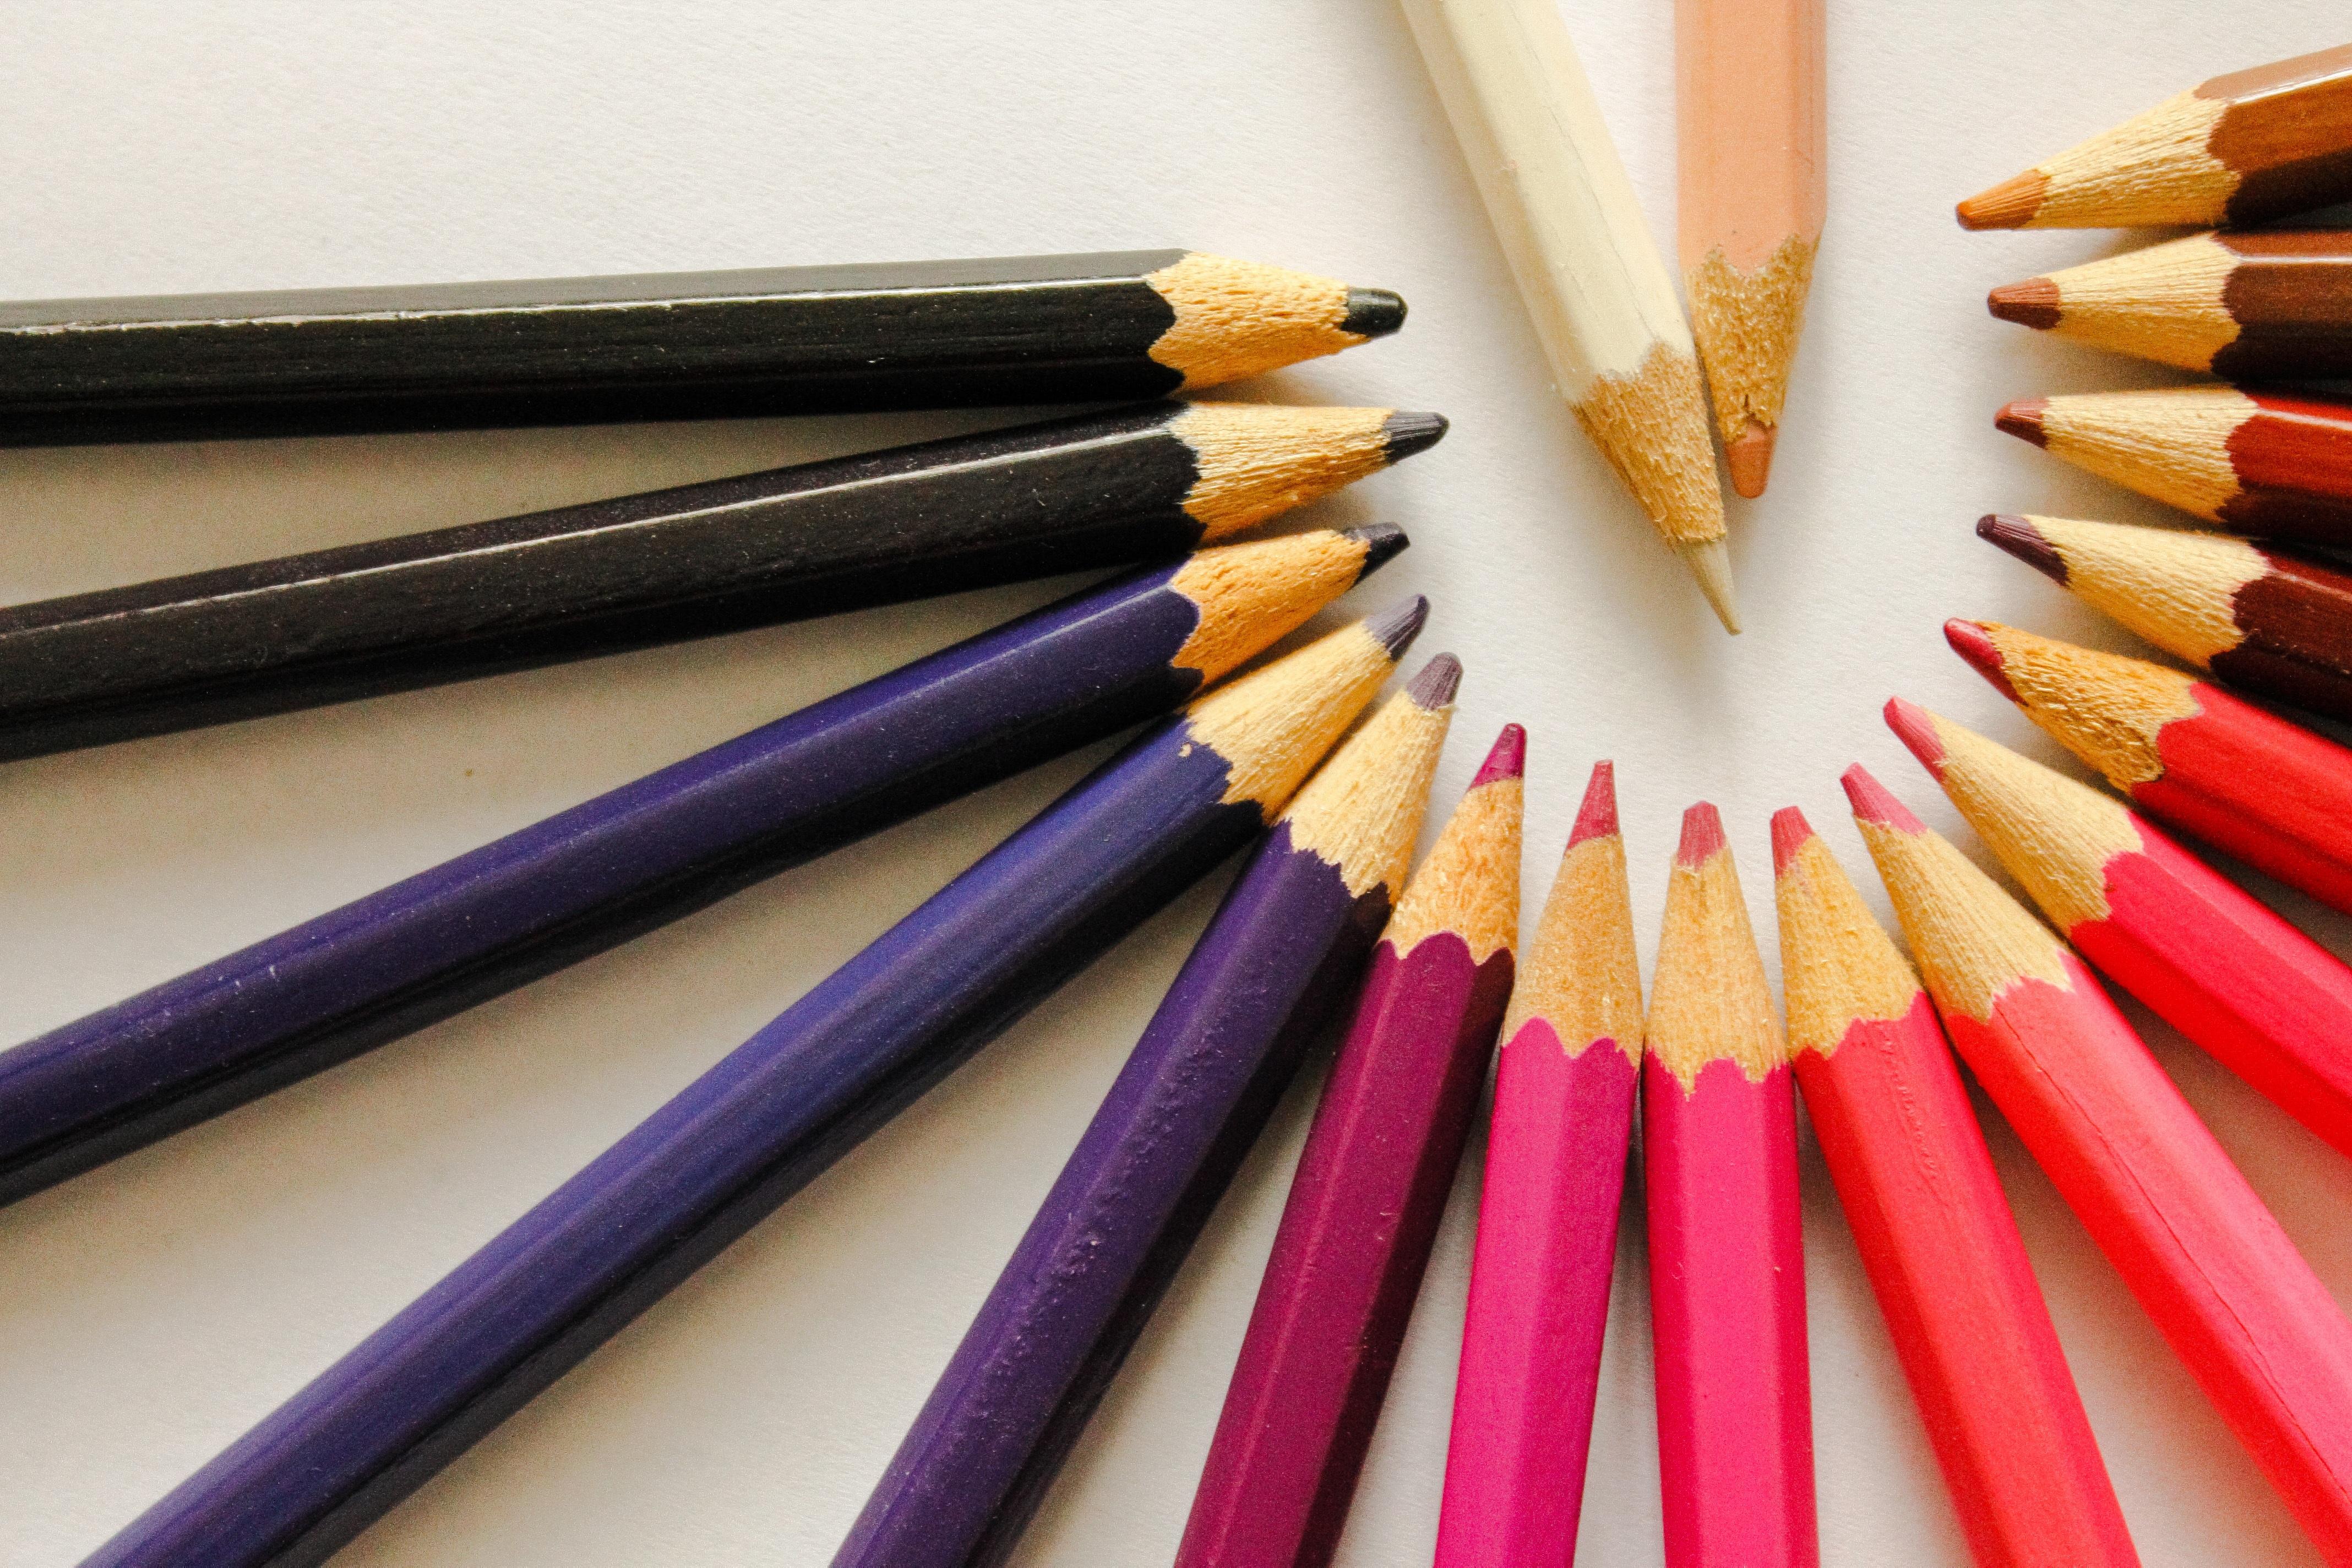 Fotos gratis : lápiz, blanco, rojo, marrón, azul, negro, vistoso ...